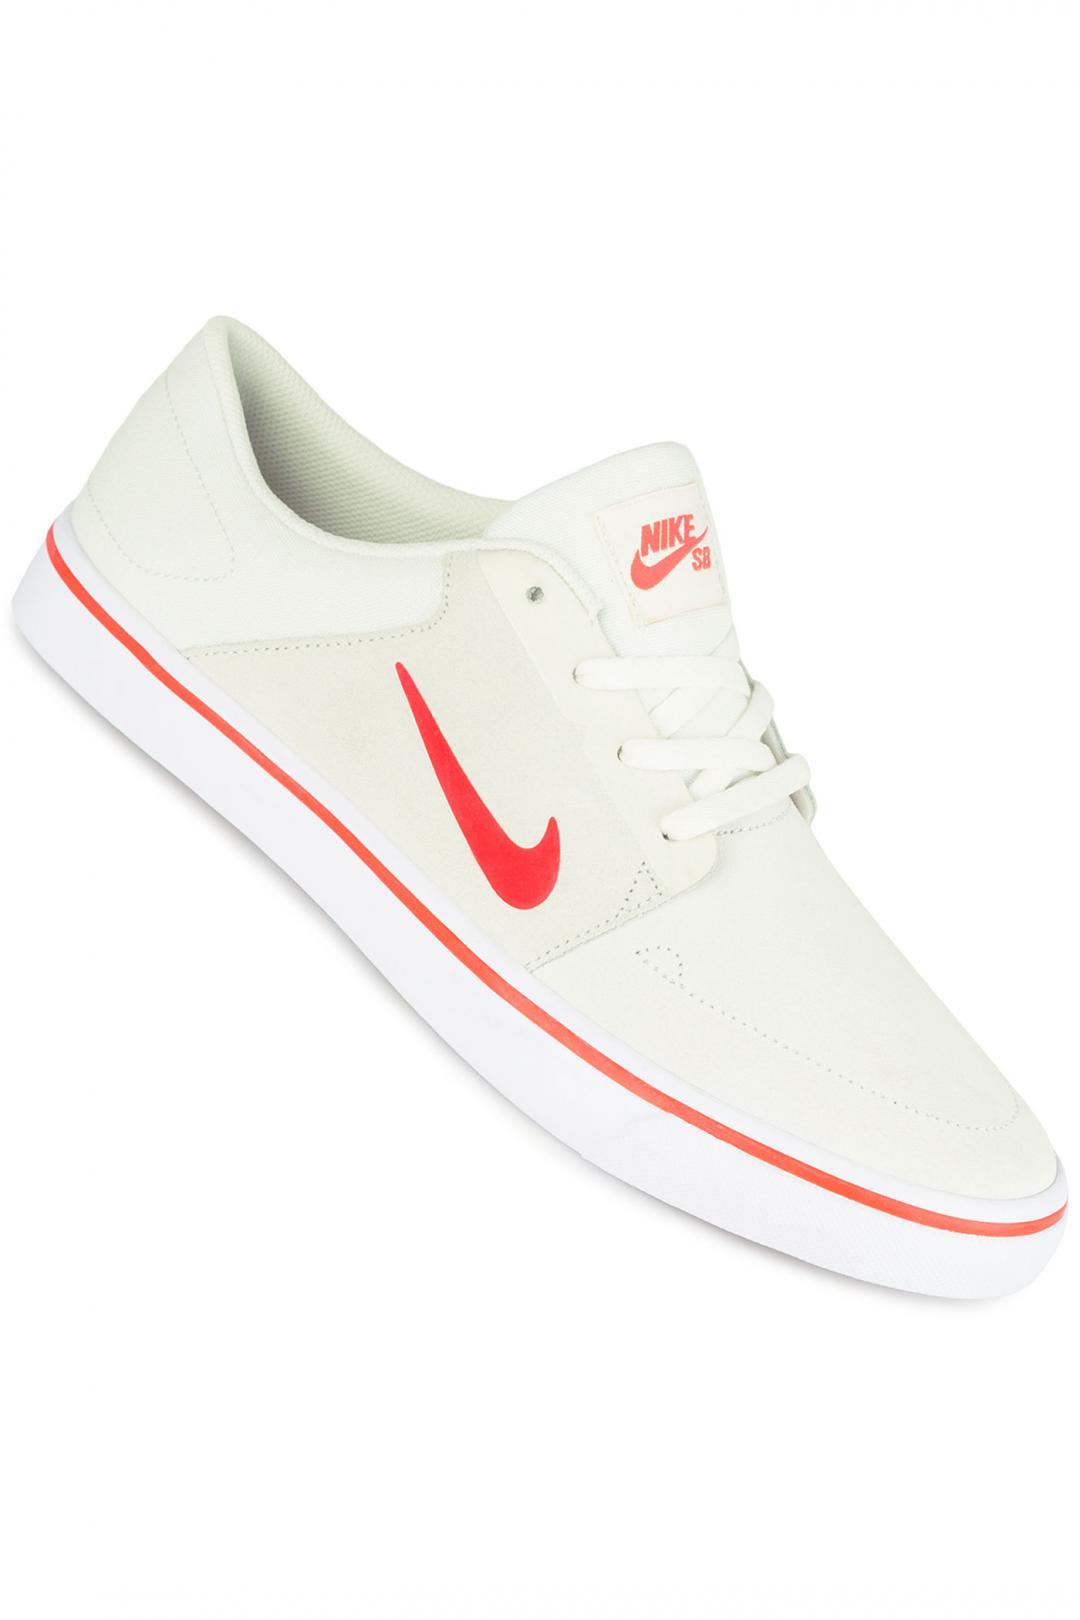 Uomo Nike SB Portmore summit white max orange white   Scarpe da skate